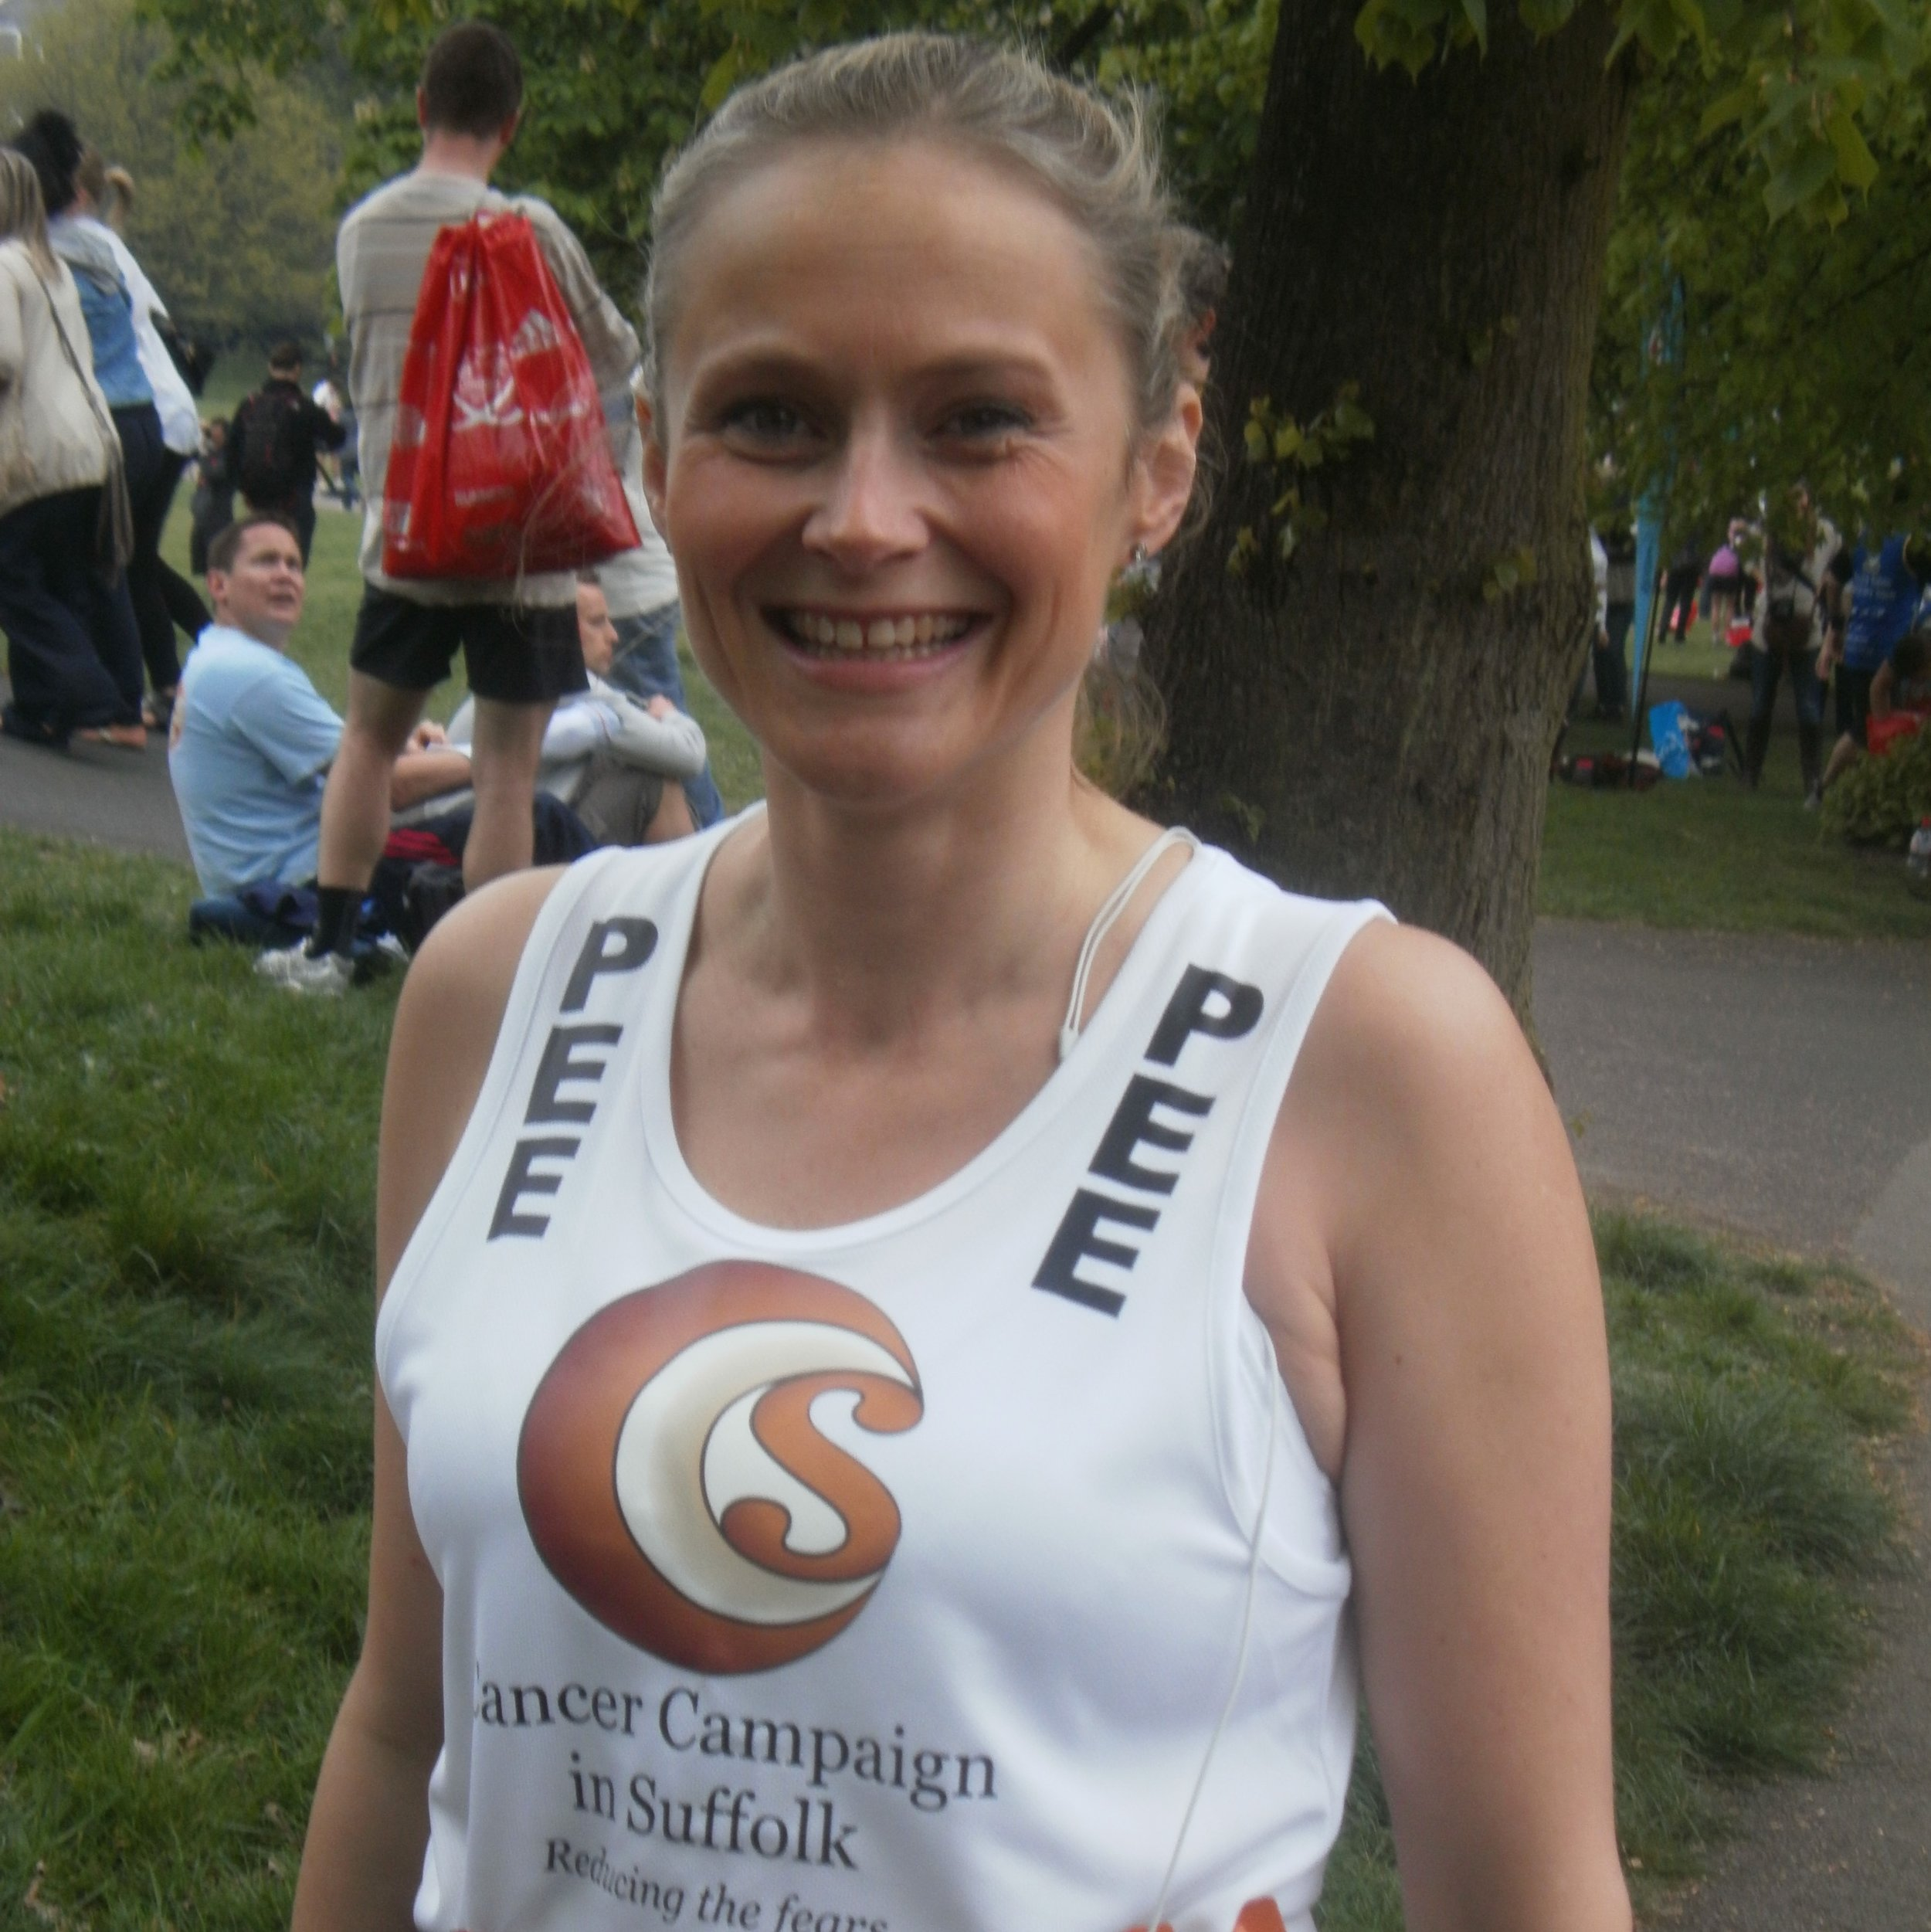 Pee at the London Marathon